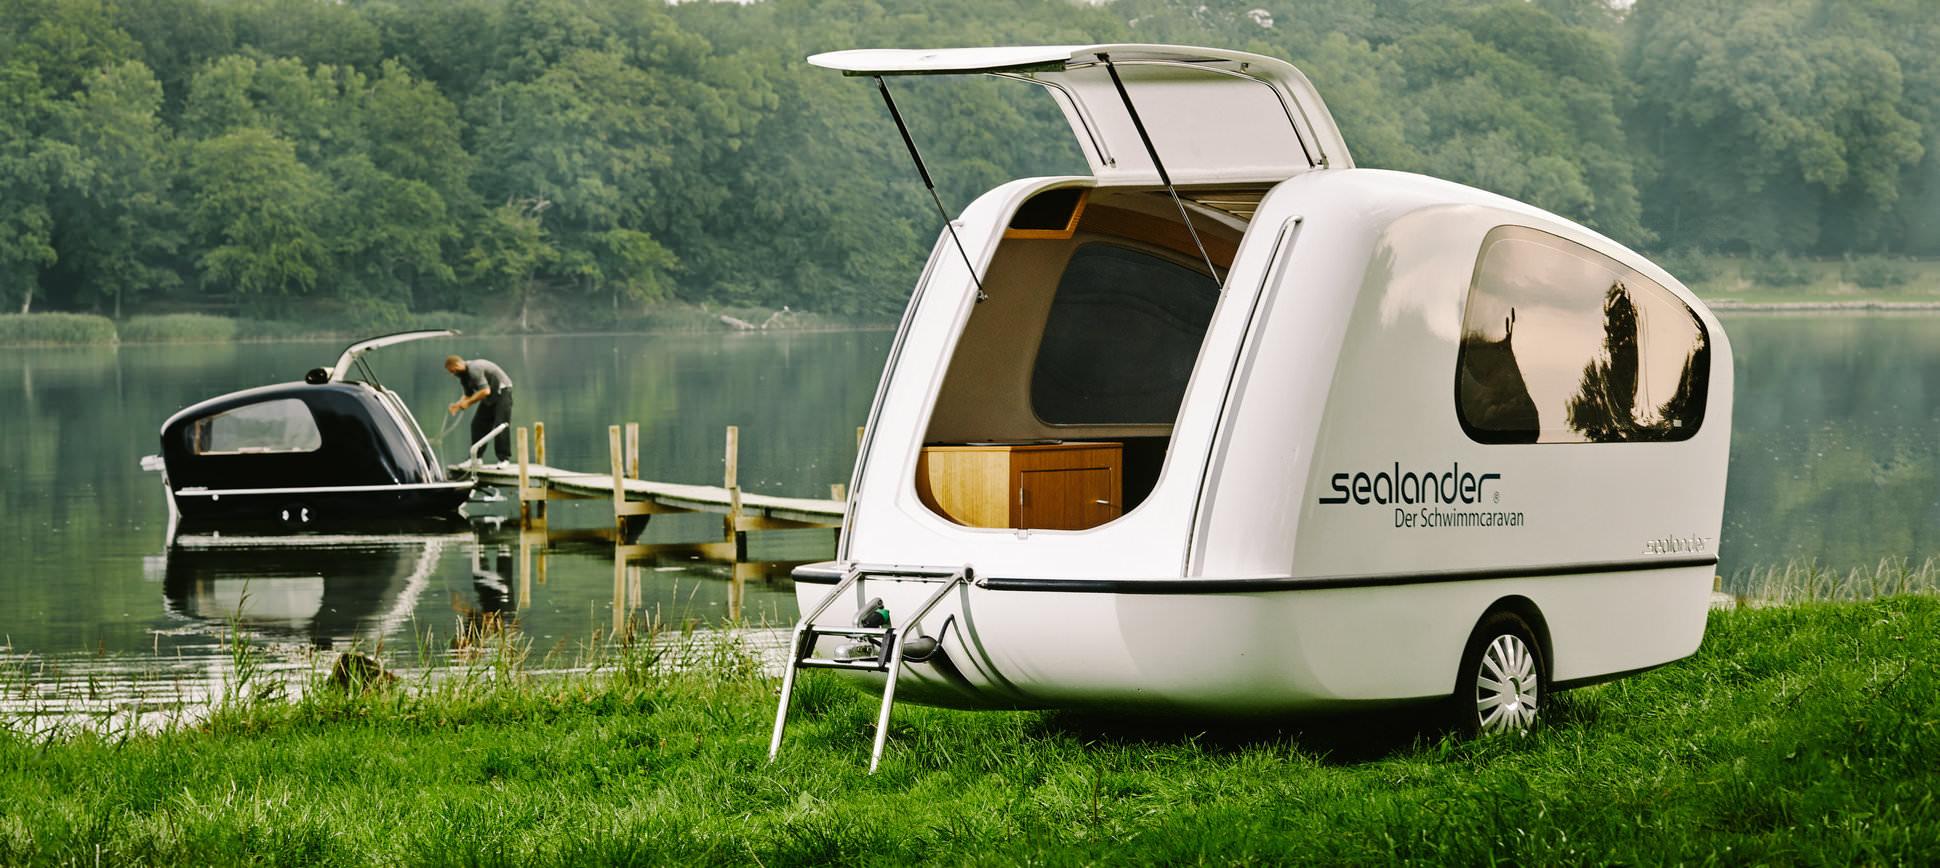 Sealander A Caravan and Yacht in e